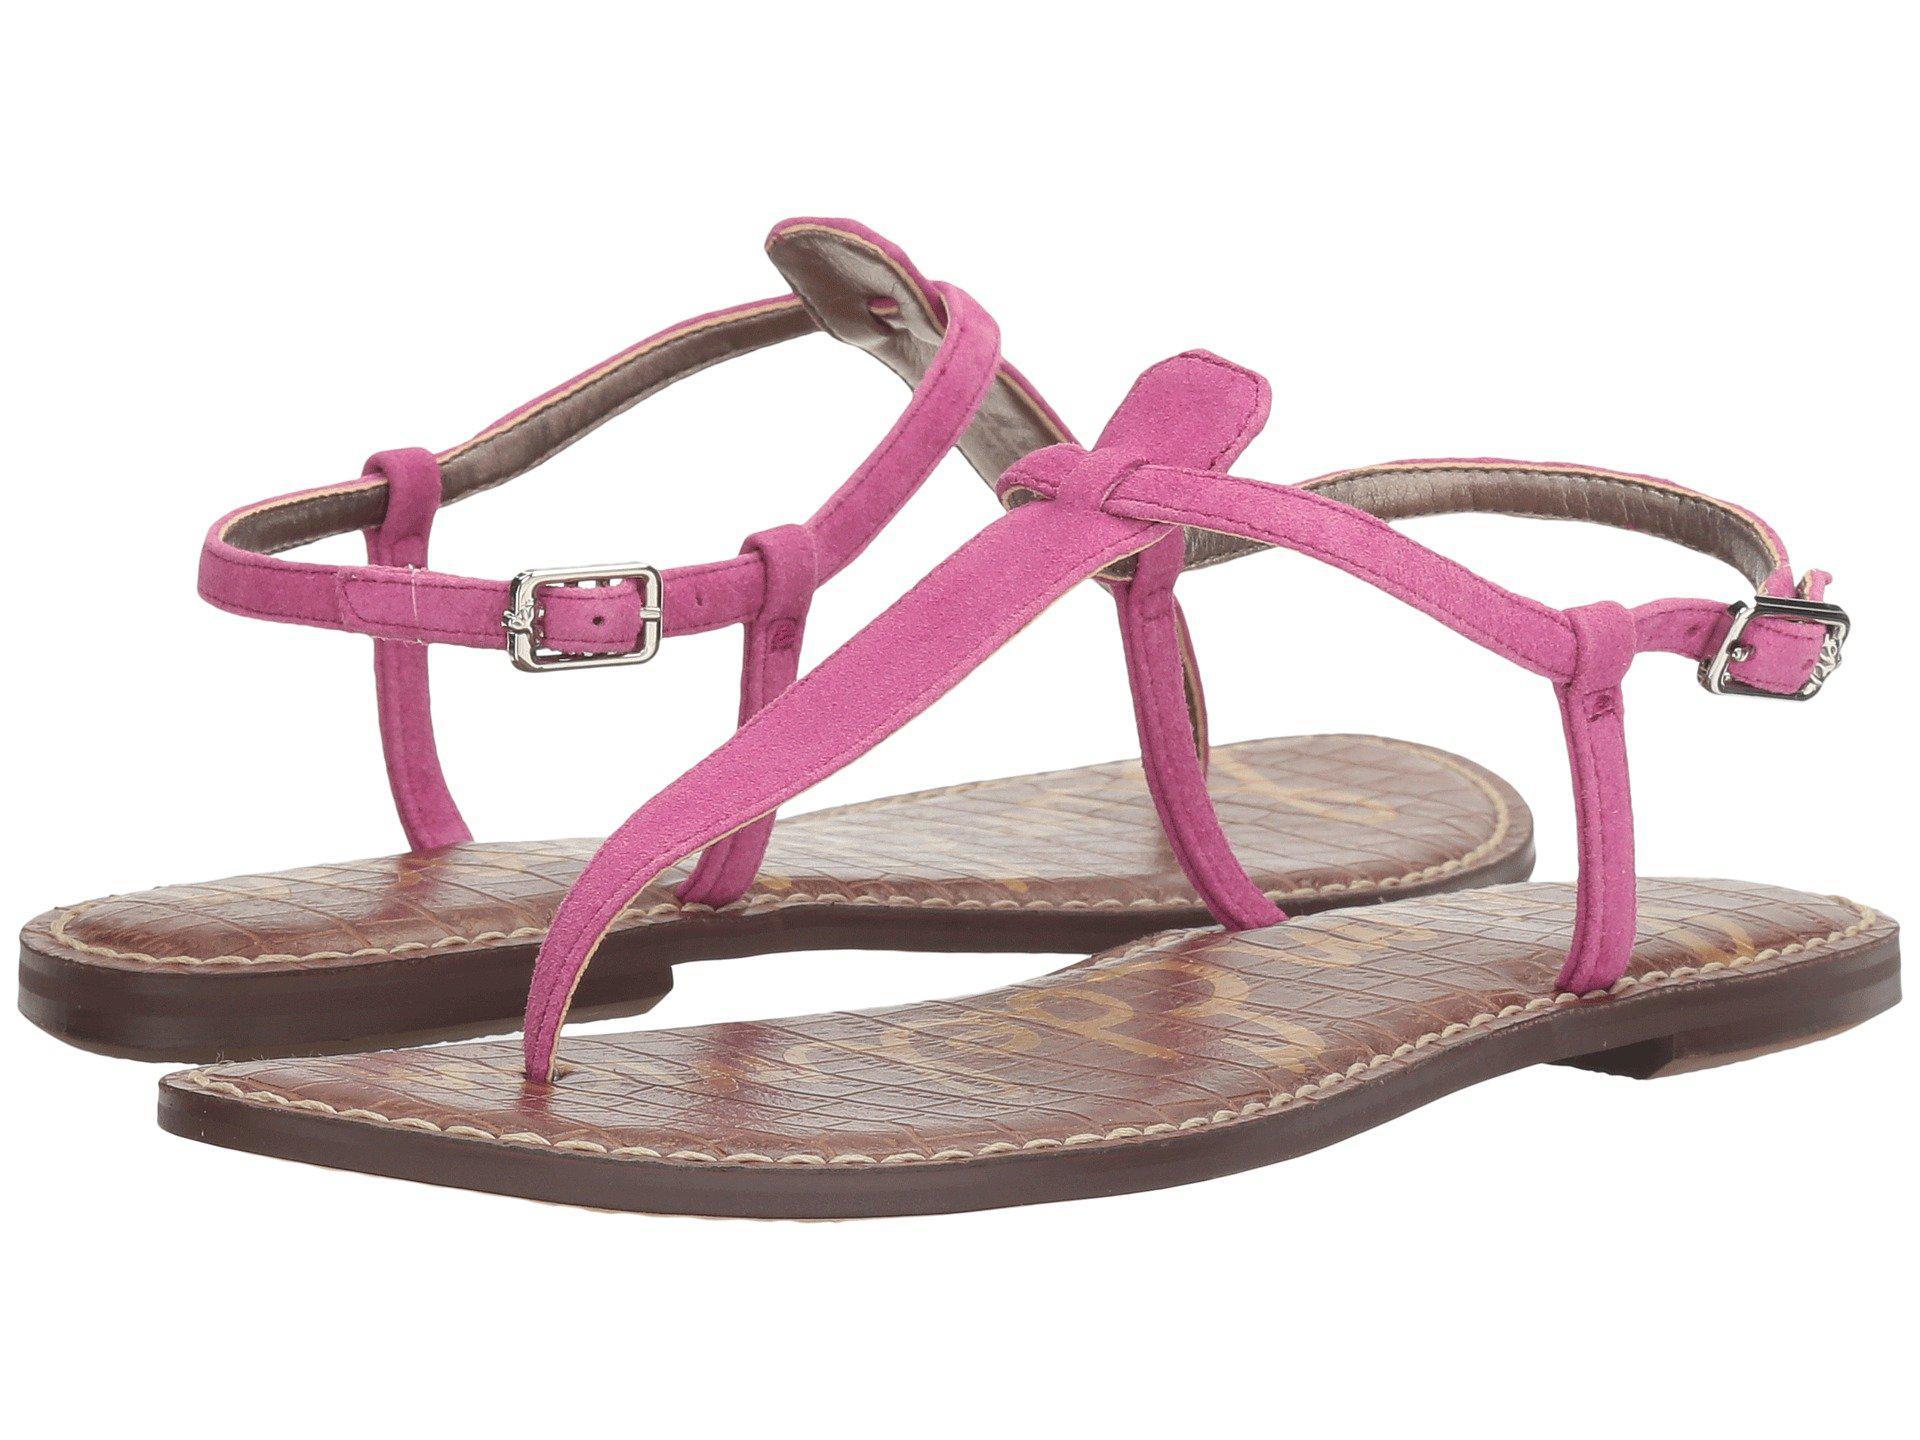 c484fea698e63 Lyst - Sam Edelman Gigi Thong Sandal in Pink